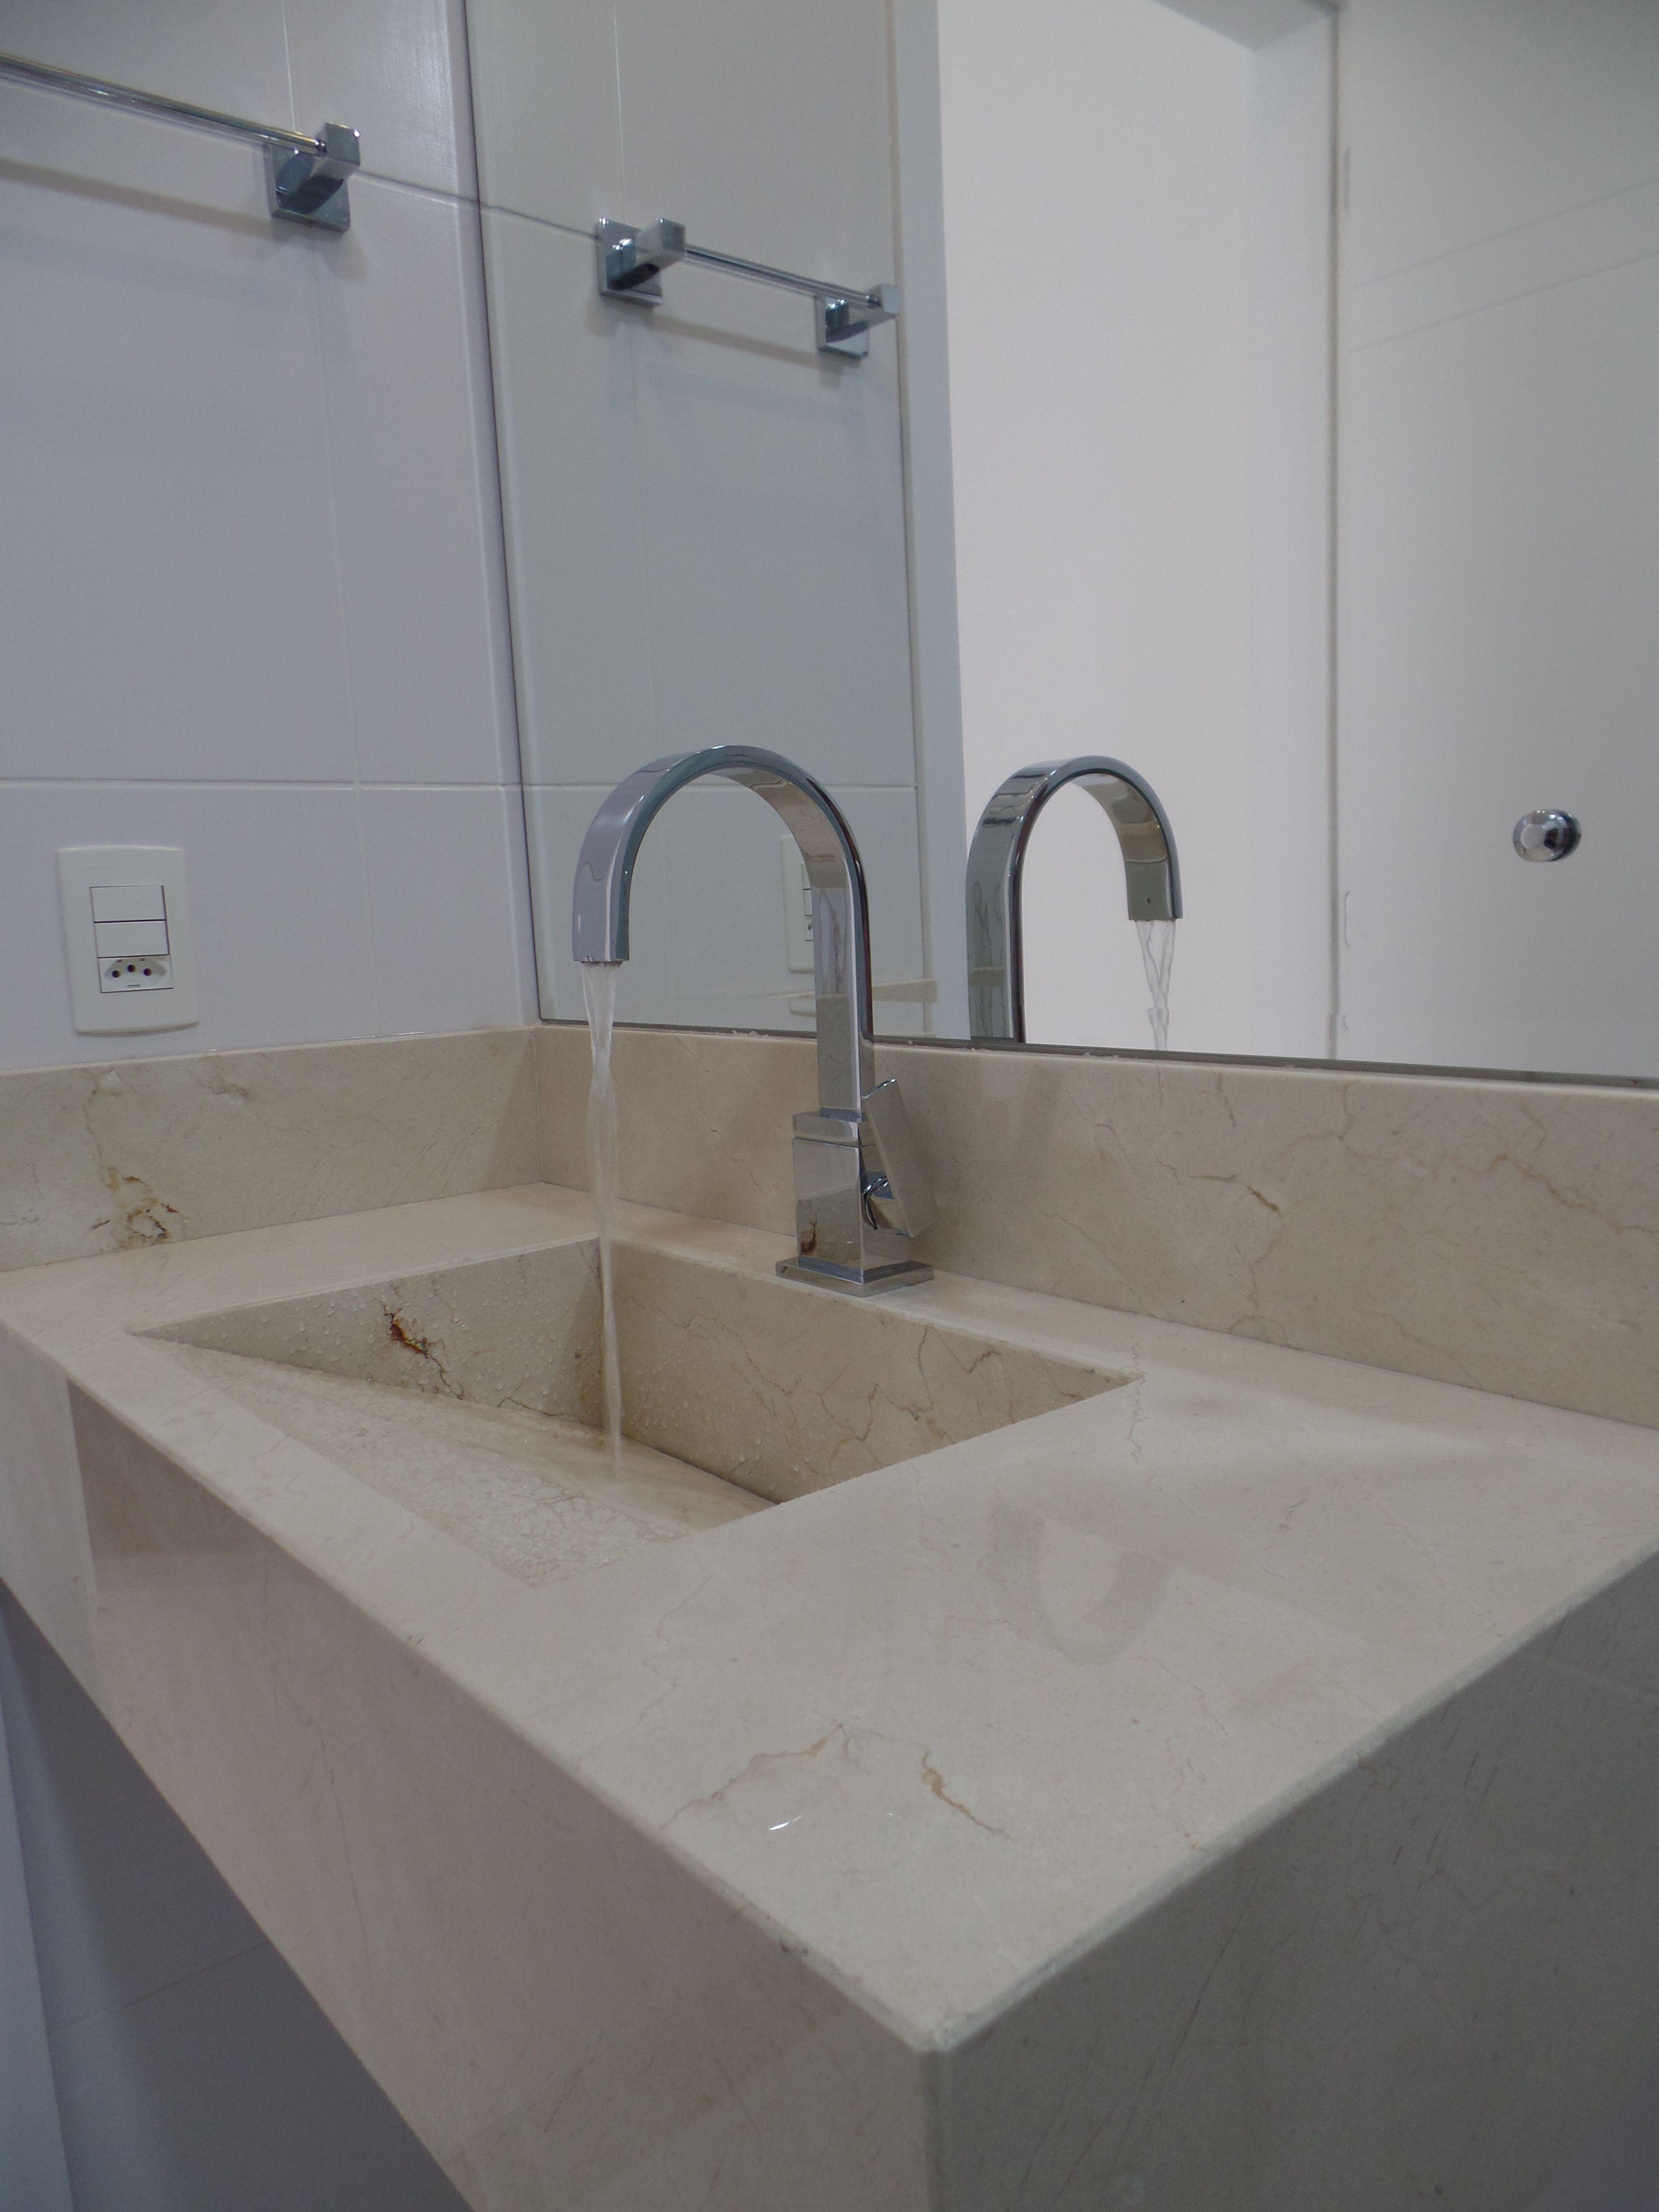 branco dallas banheiro  Pesquisa Google  Home sweet home  Pinterest  Banh -> Decoracao De Banheiro Com Cuba De Apoio